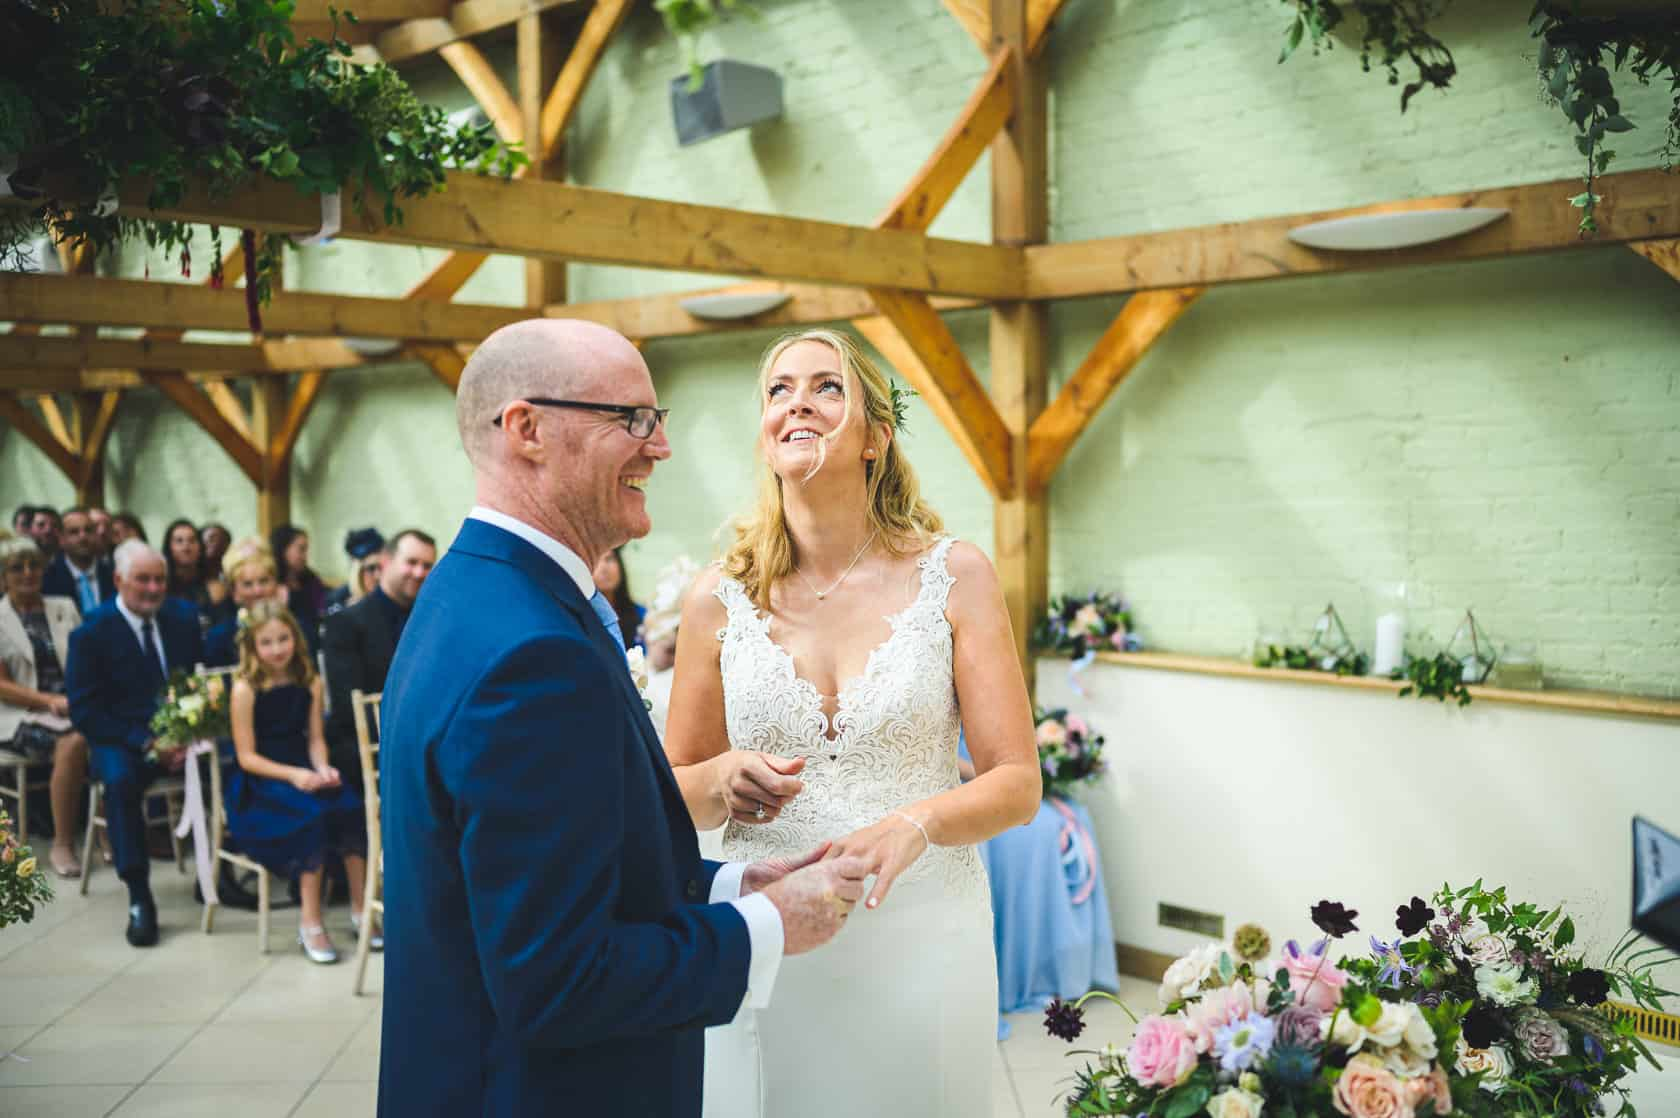 Best_Wedding_Photography_2019_Wedding-Photographer-Essex_114